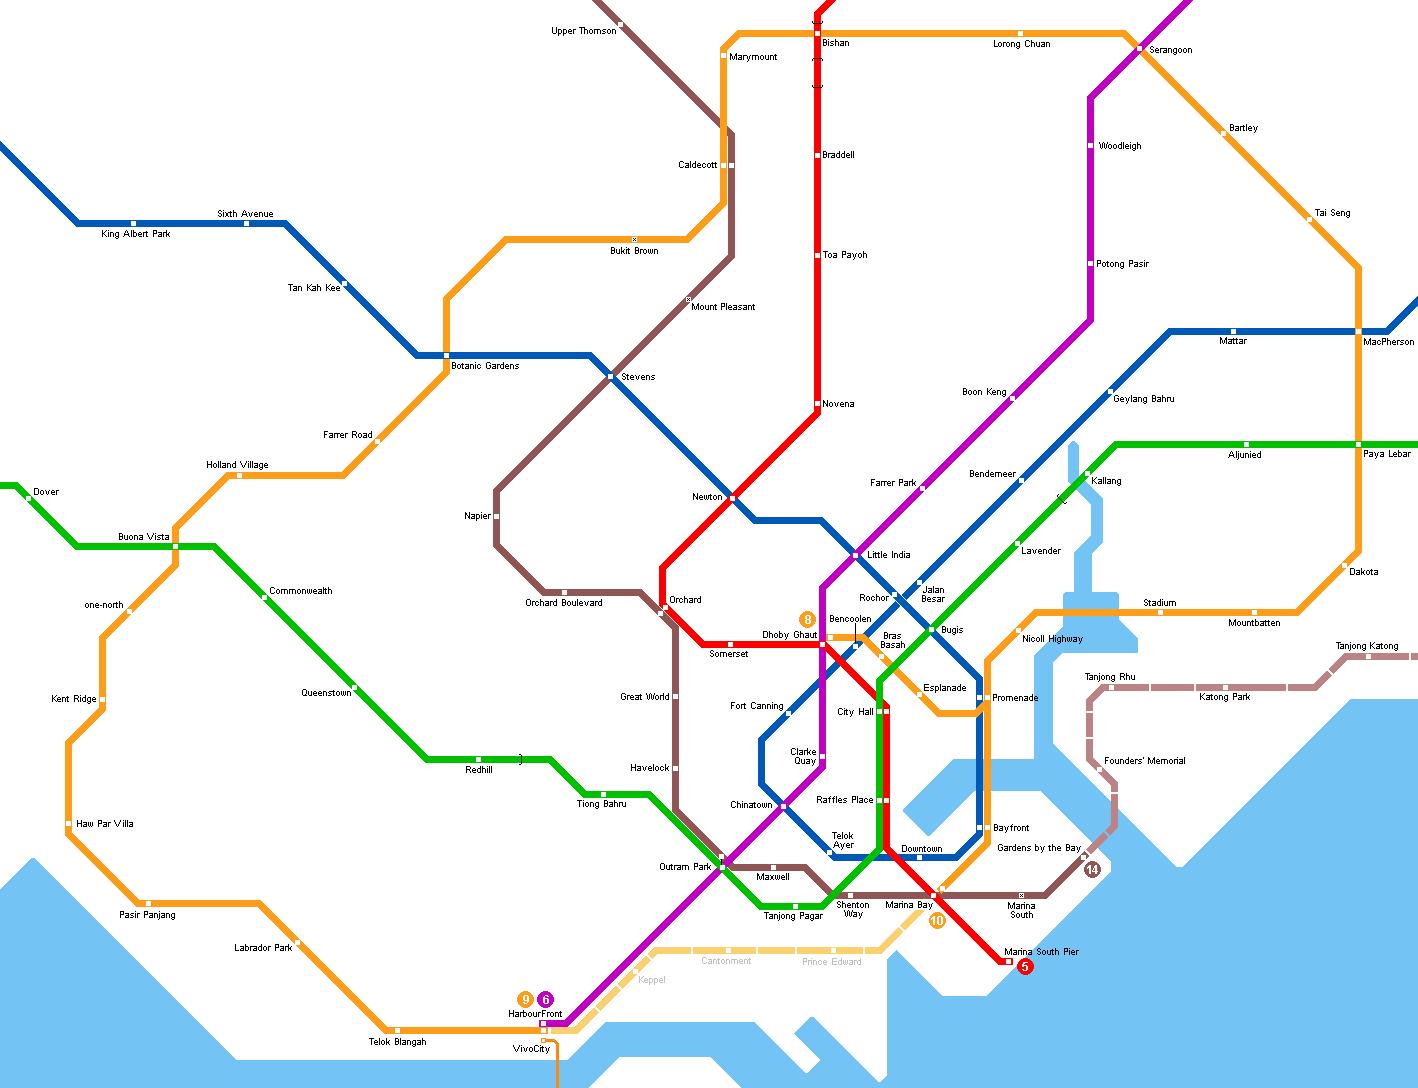 Map Of Asia North South East West.Urbanrail Net Asia Singapore Singapore Mrt Metro